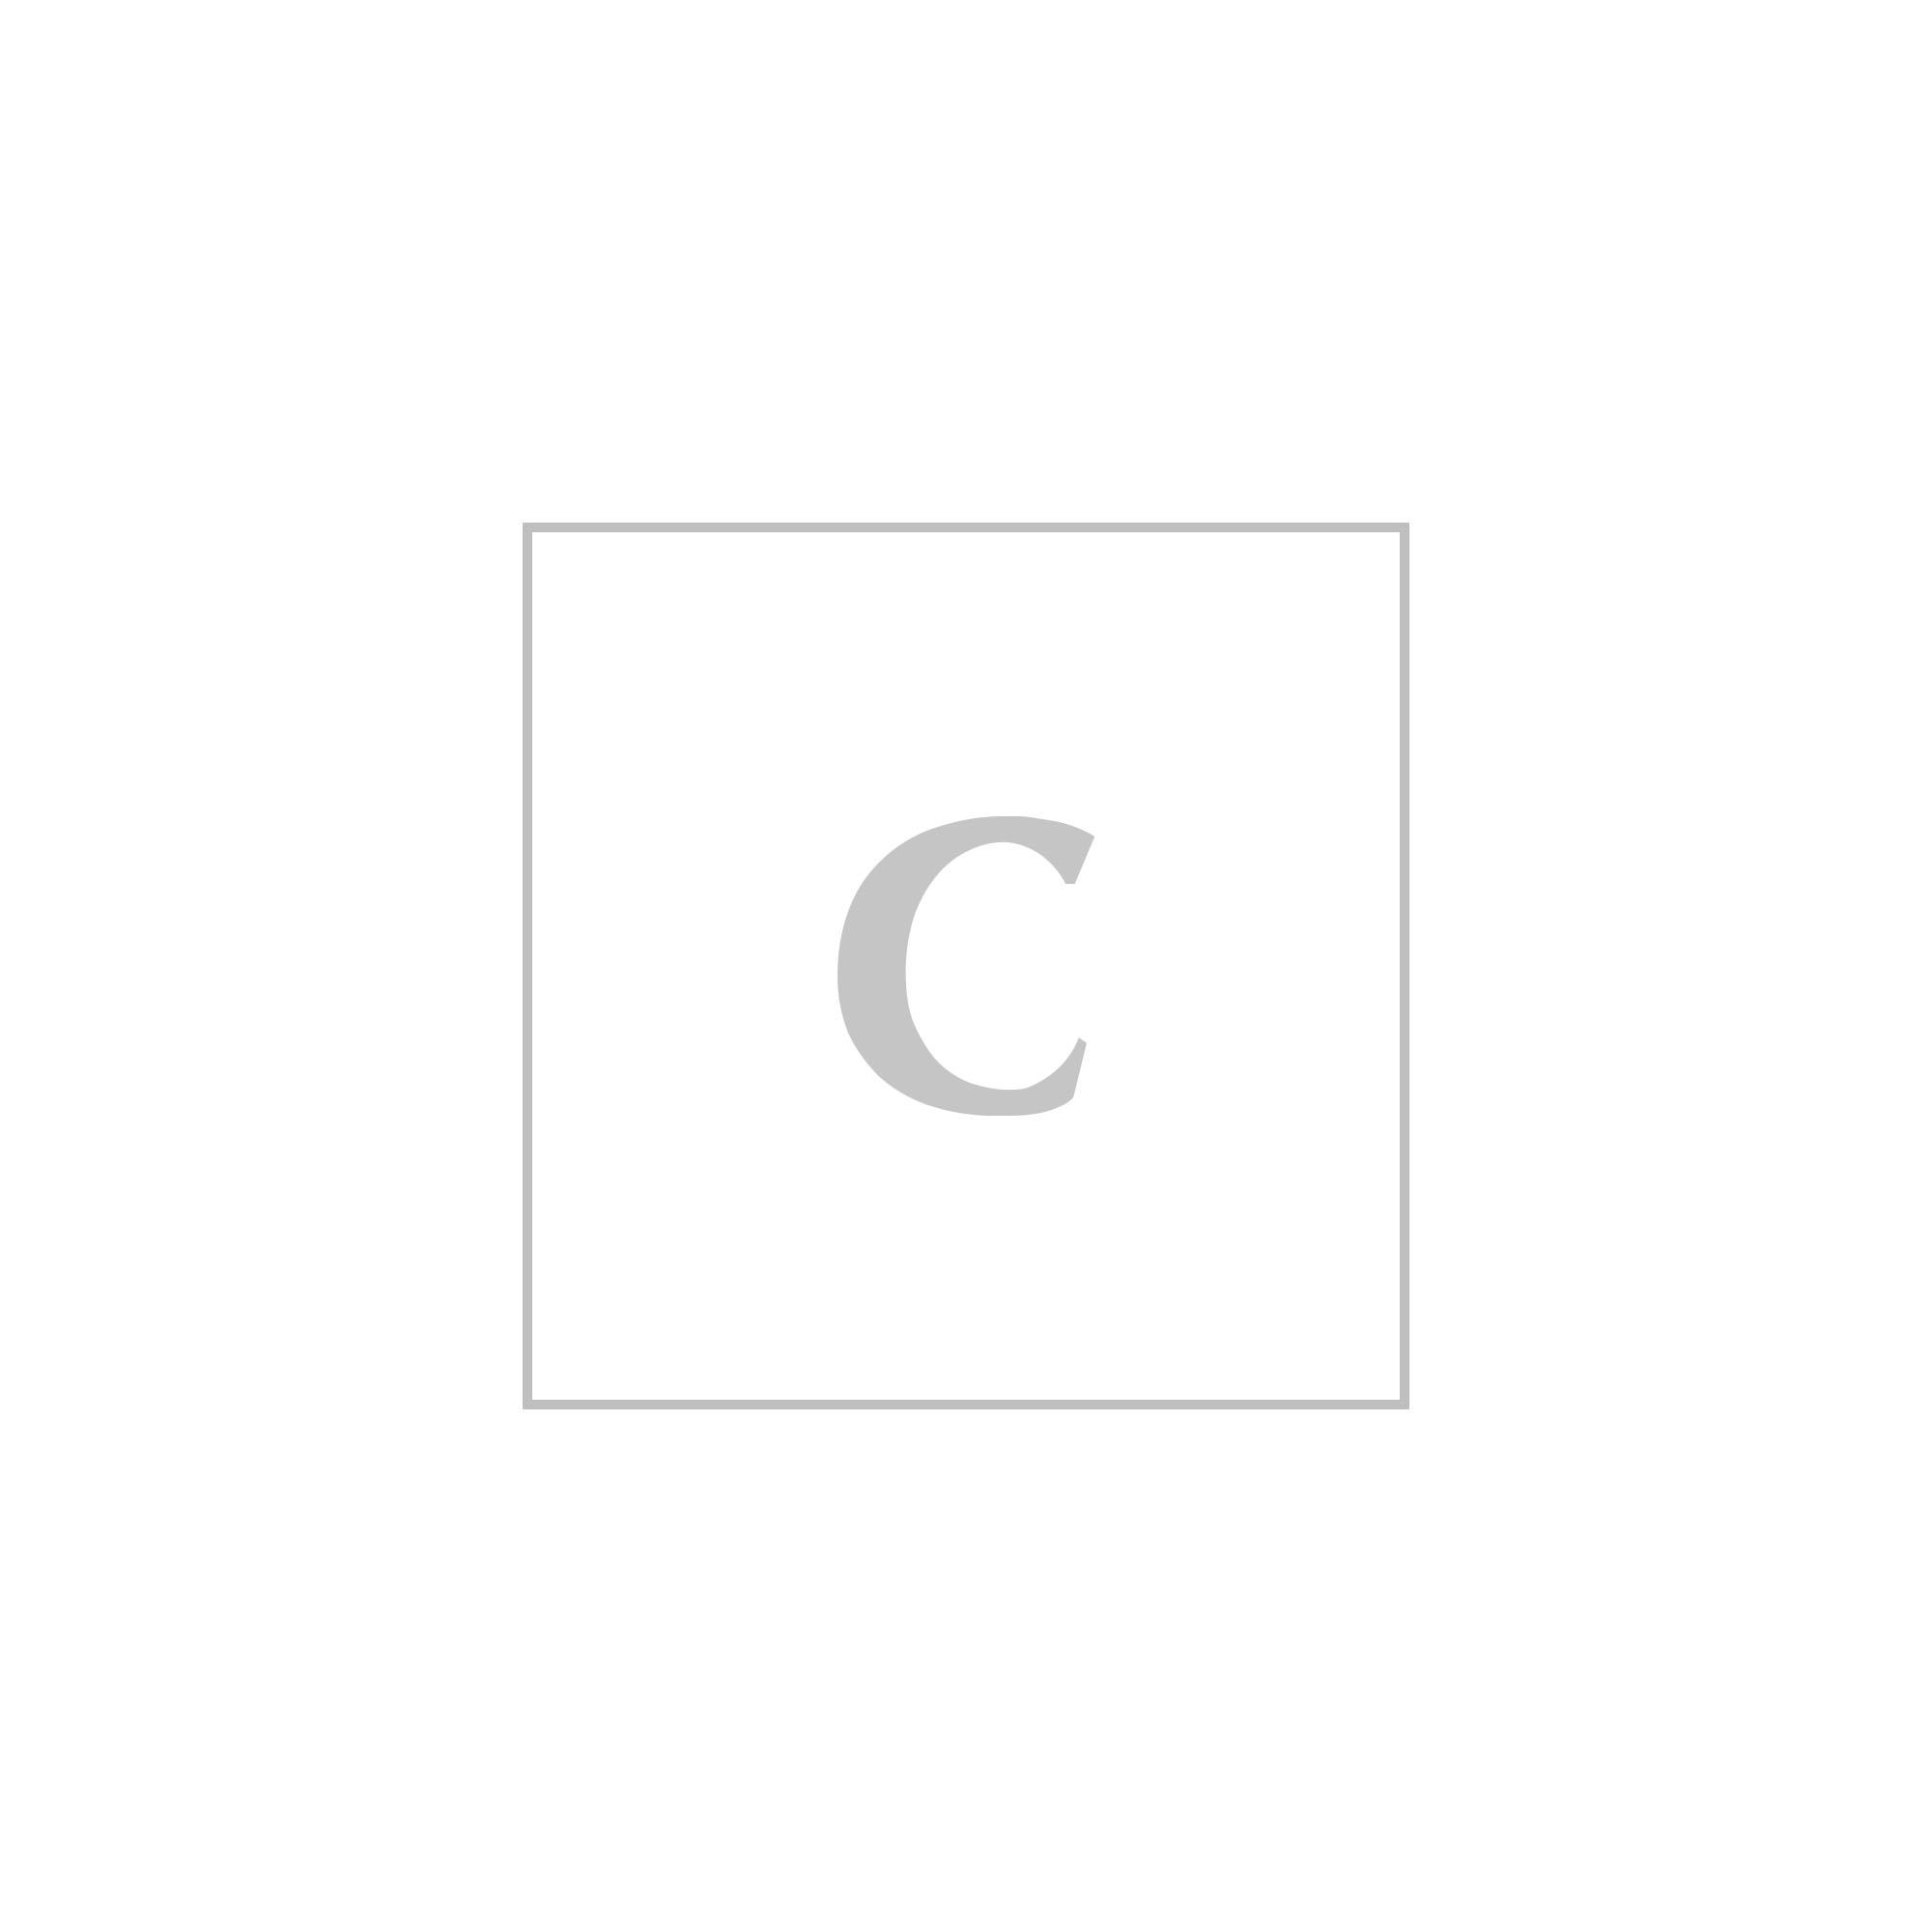 Saint laurent ysl borsa maniglia corta monogram